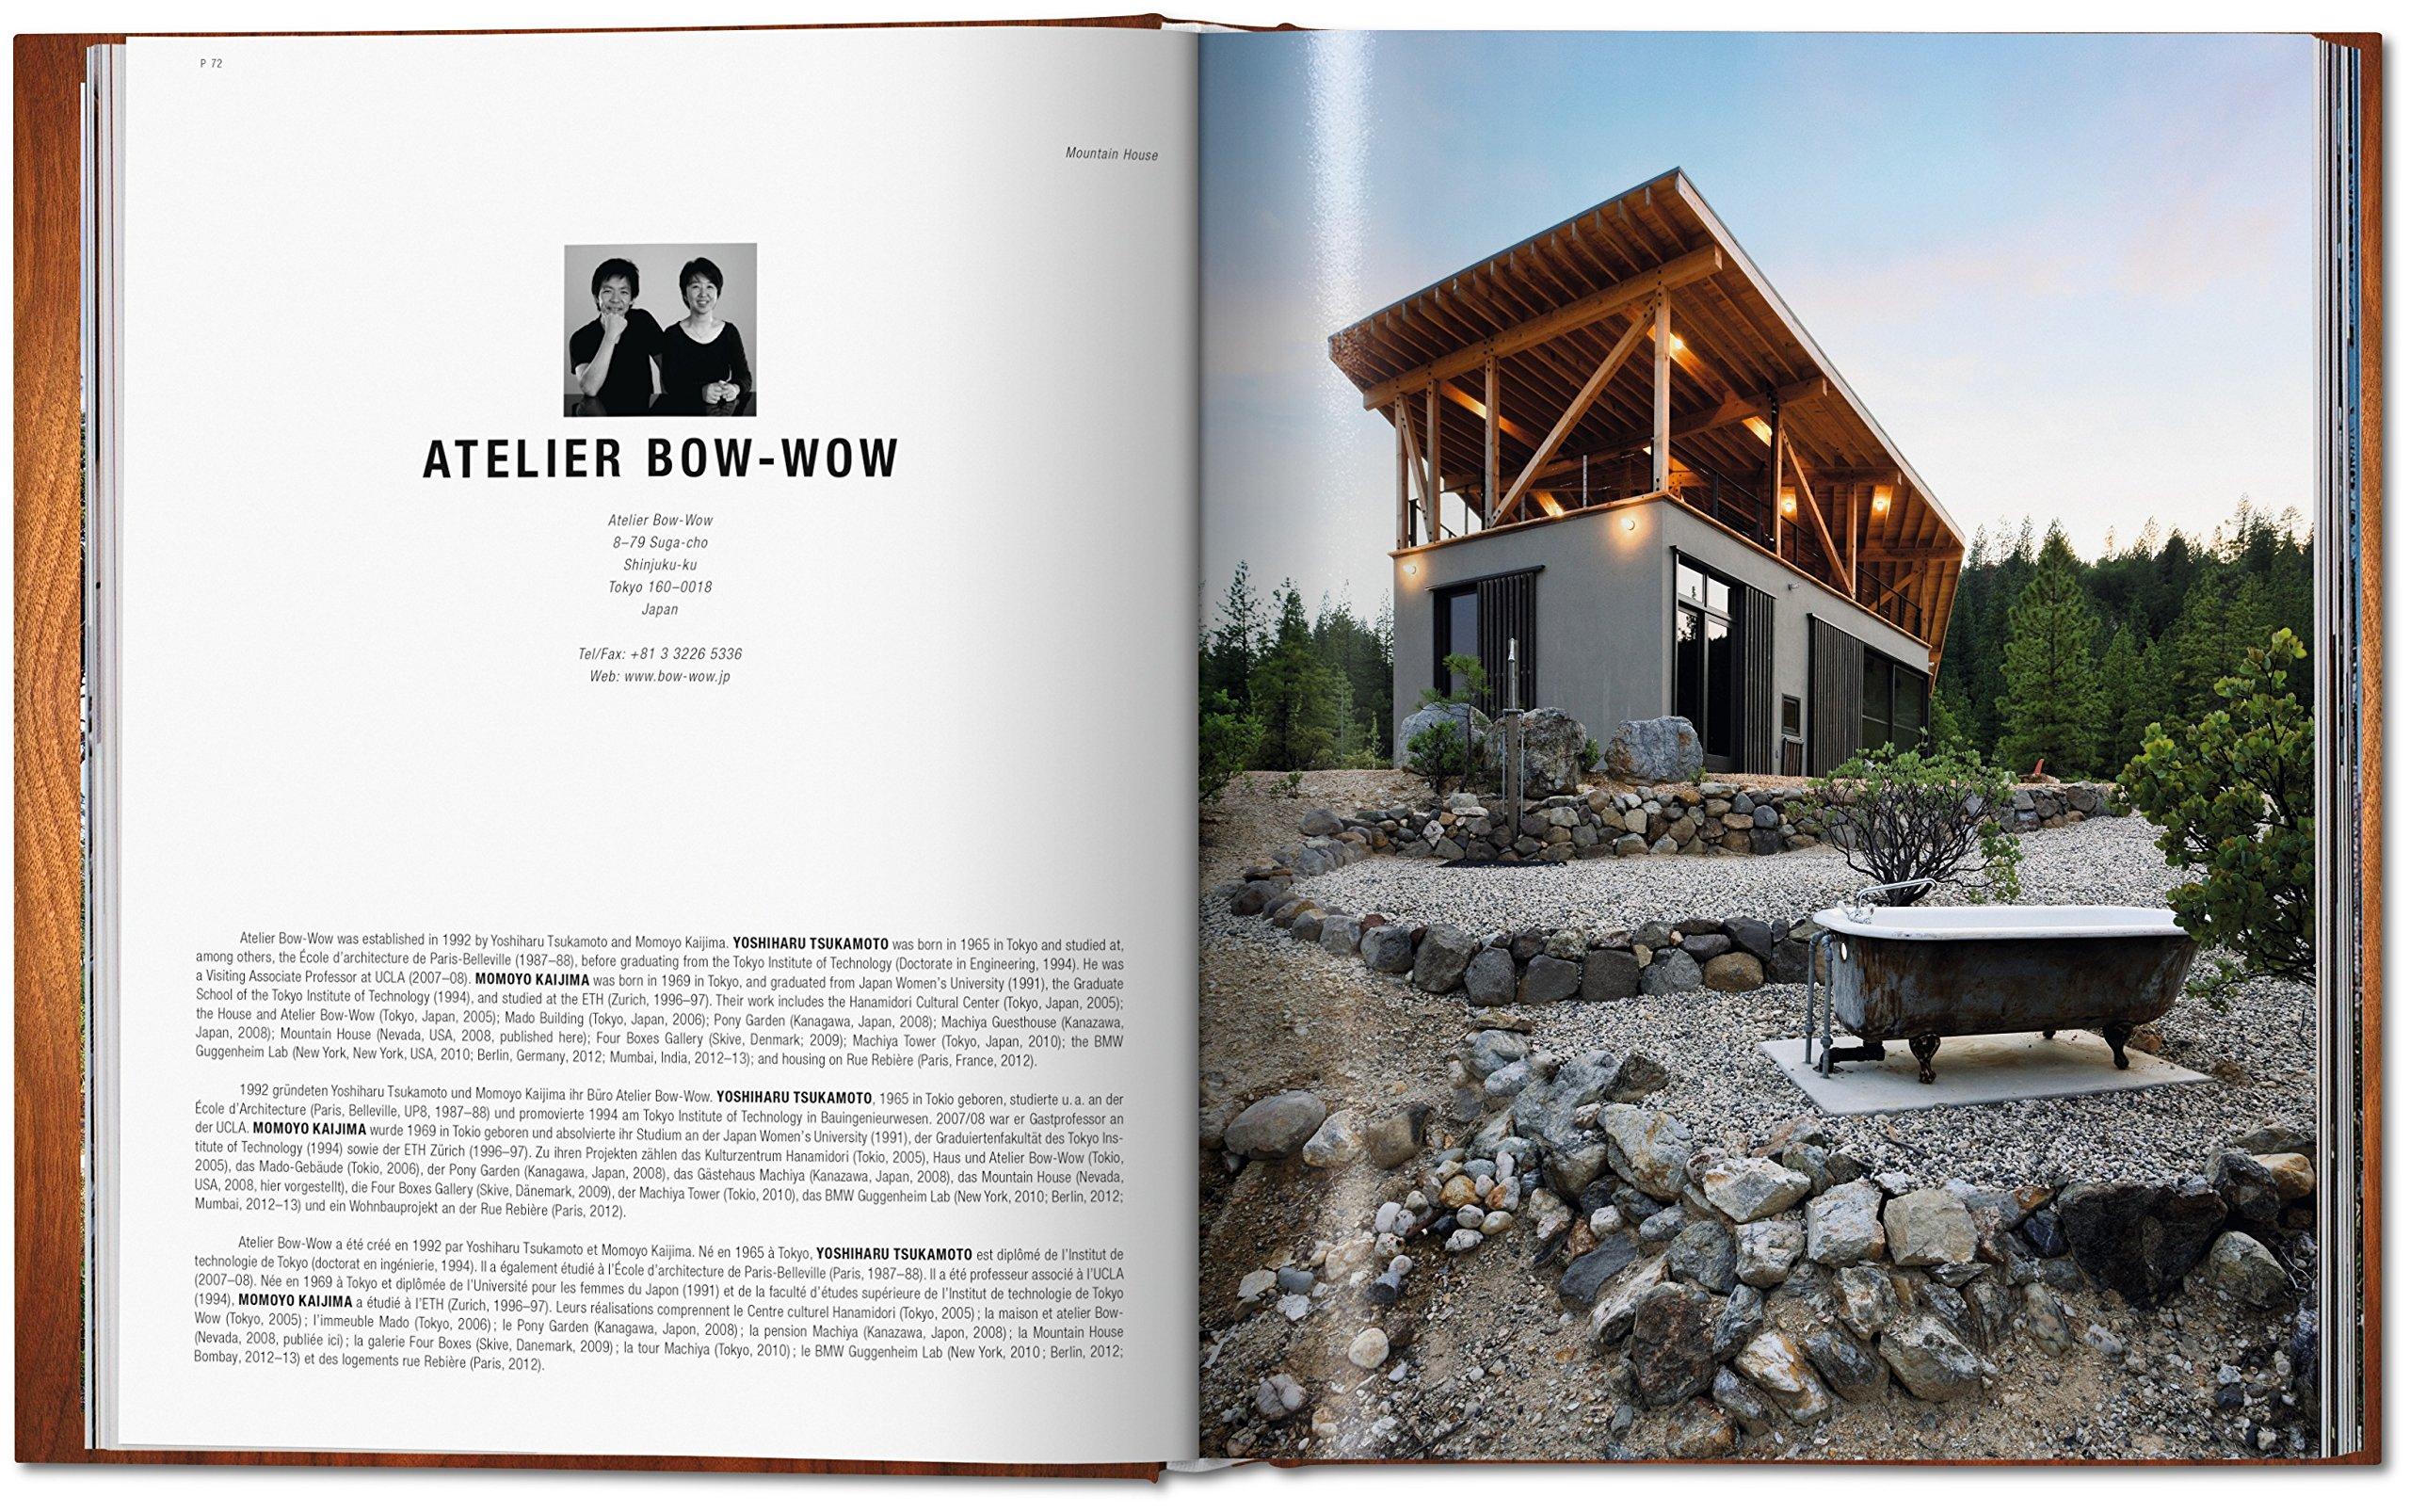 100 contemporary wood buildings philip jodidio 9783836542814 amazon com books